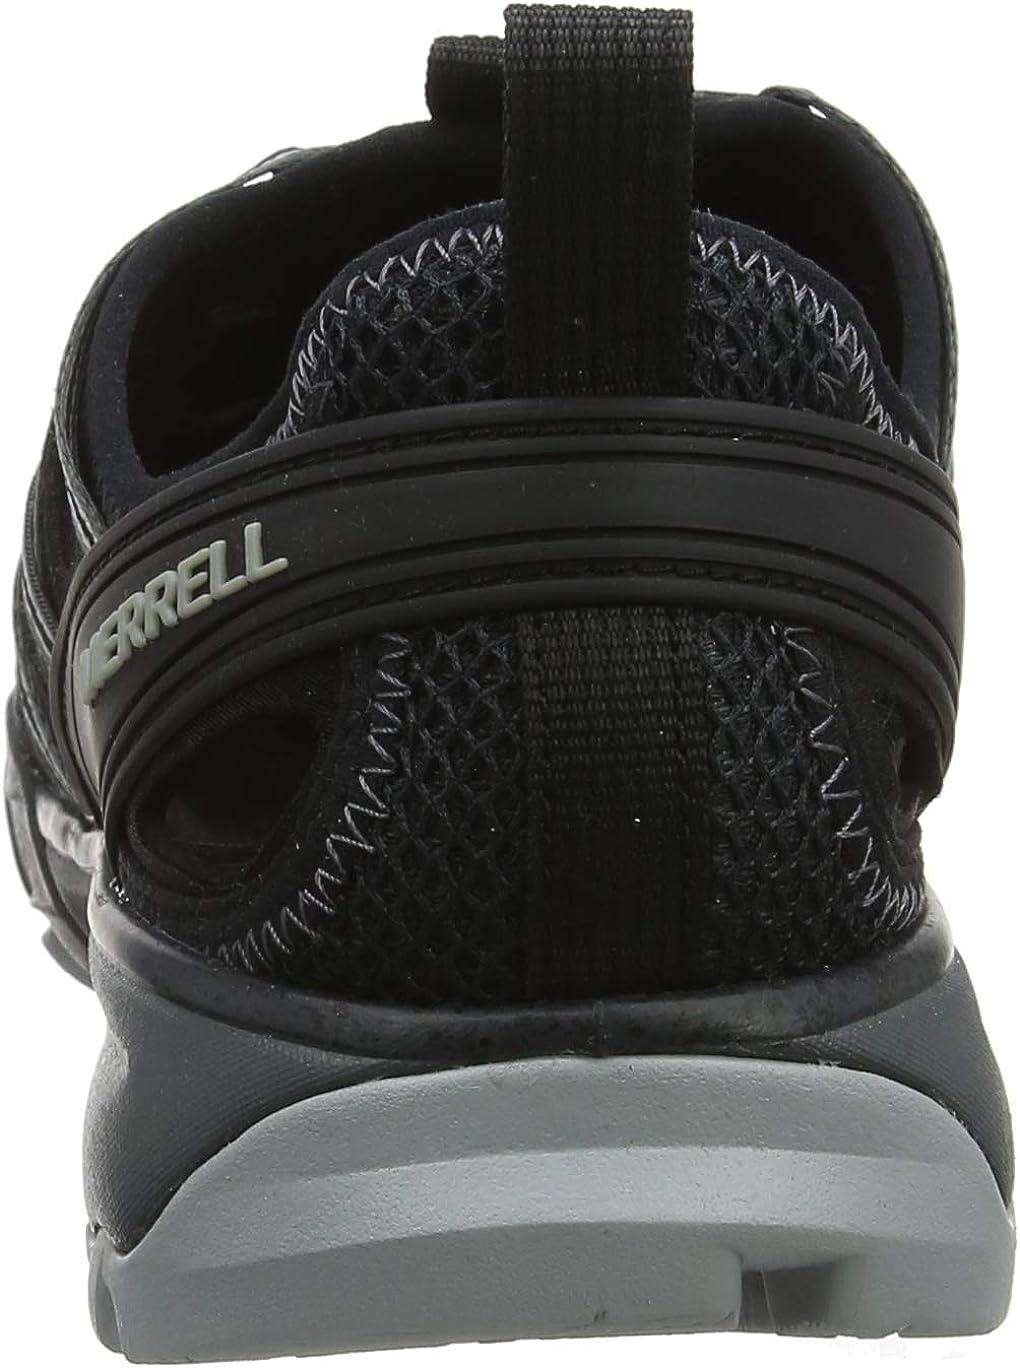 Merrell Choprock Shandal, Chaussures de Sports Aquatiques Homme Noir Black